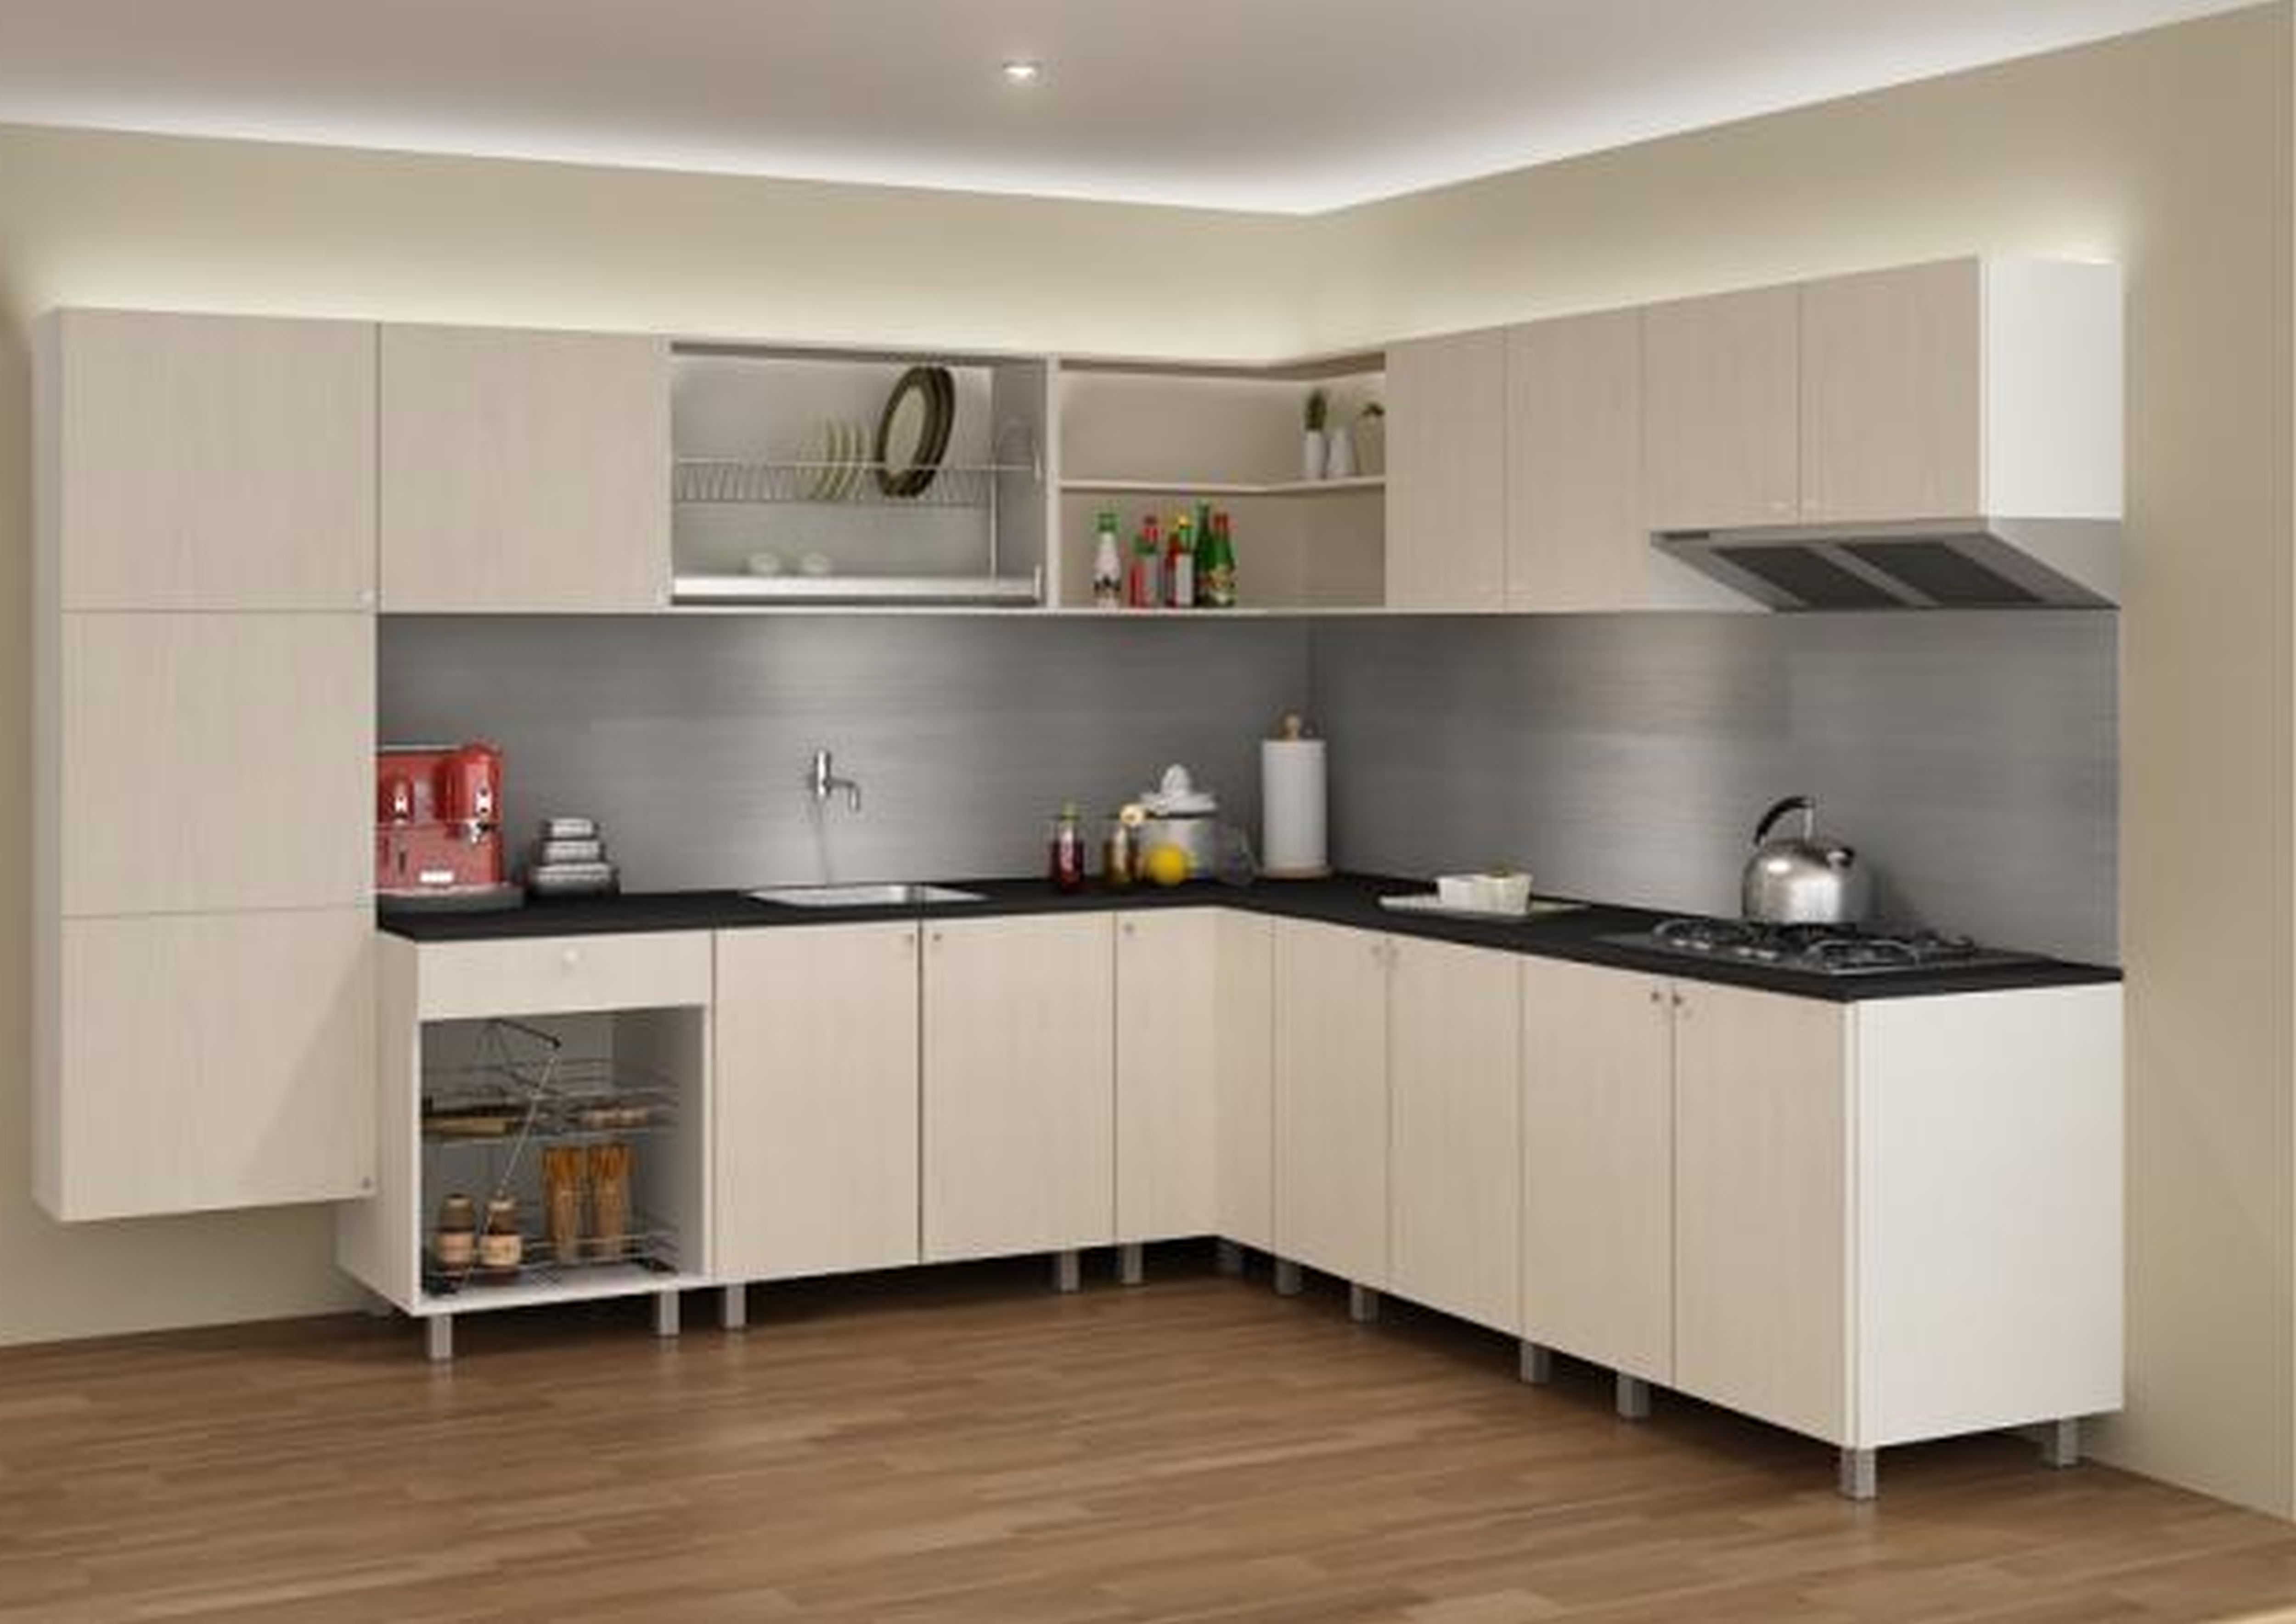 Cheap Kitchen Furniture With White Colors Desain Rumah Desain Rumah